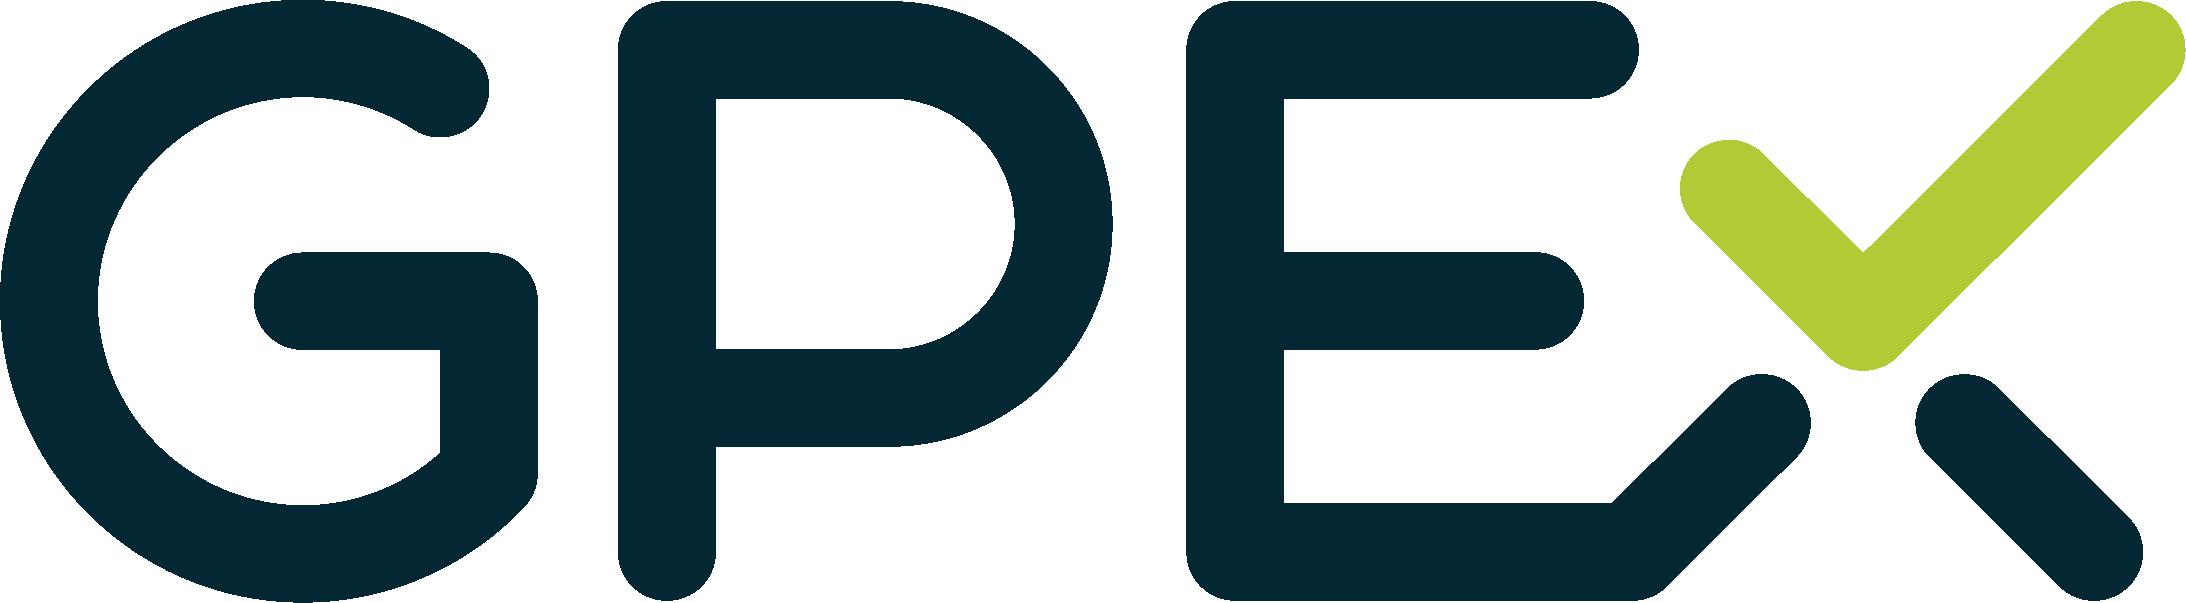 GPEx logo